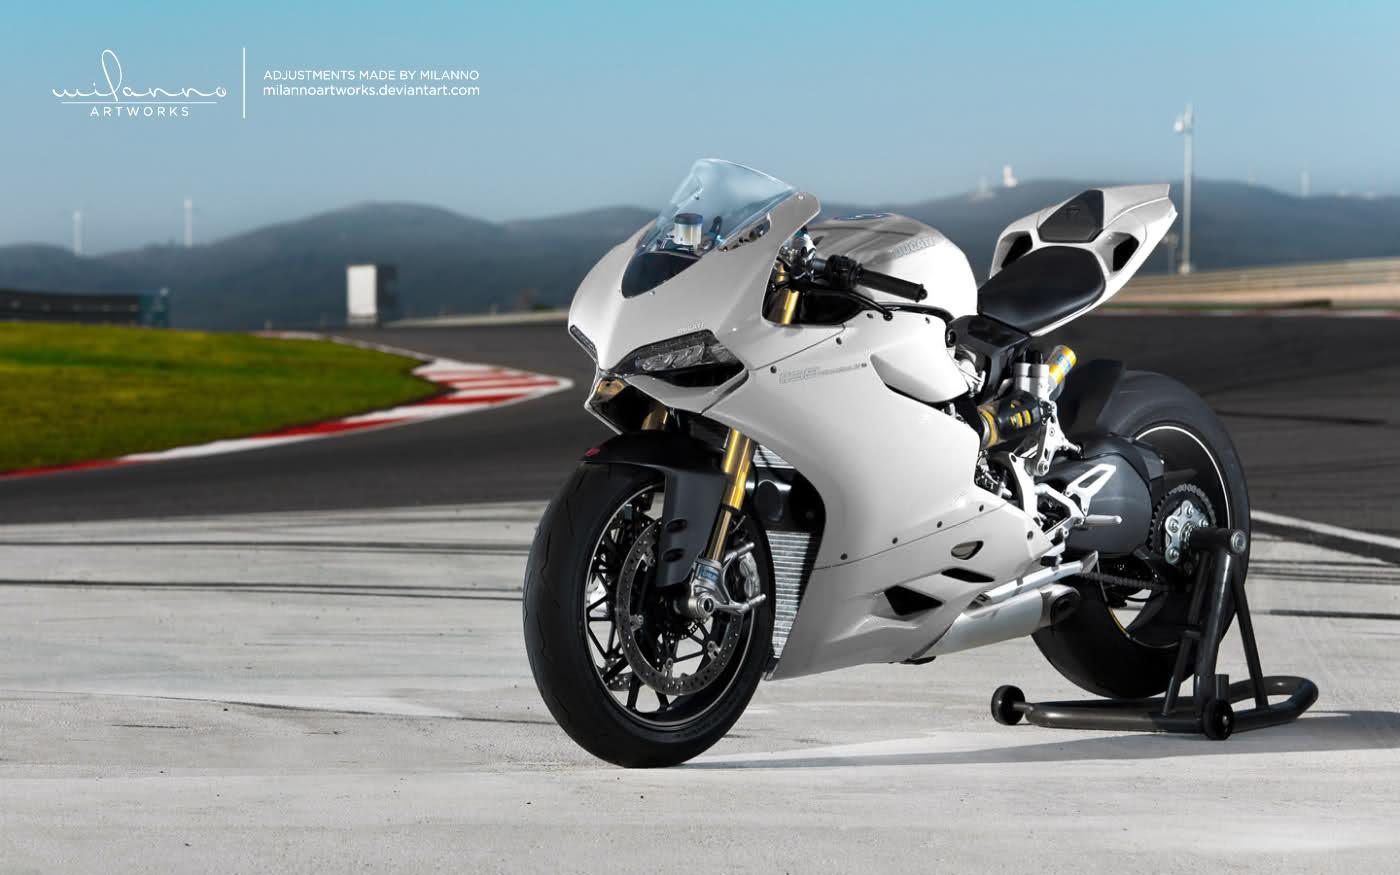 http://3.bp.blogspot.com/-CTds3PnIAsQ/T1NS5nCfiUI/AAAAAAAAGHA/hw92iEHtptg/s1600/Ducati%2B1199%2BPanigale%2B20.jpg